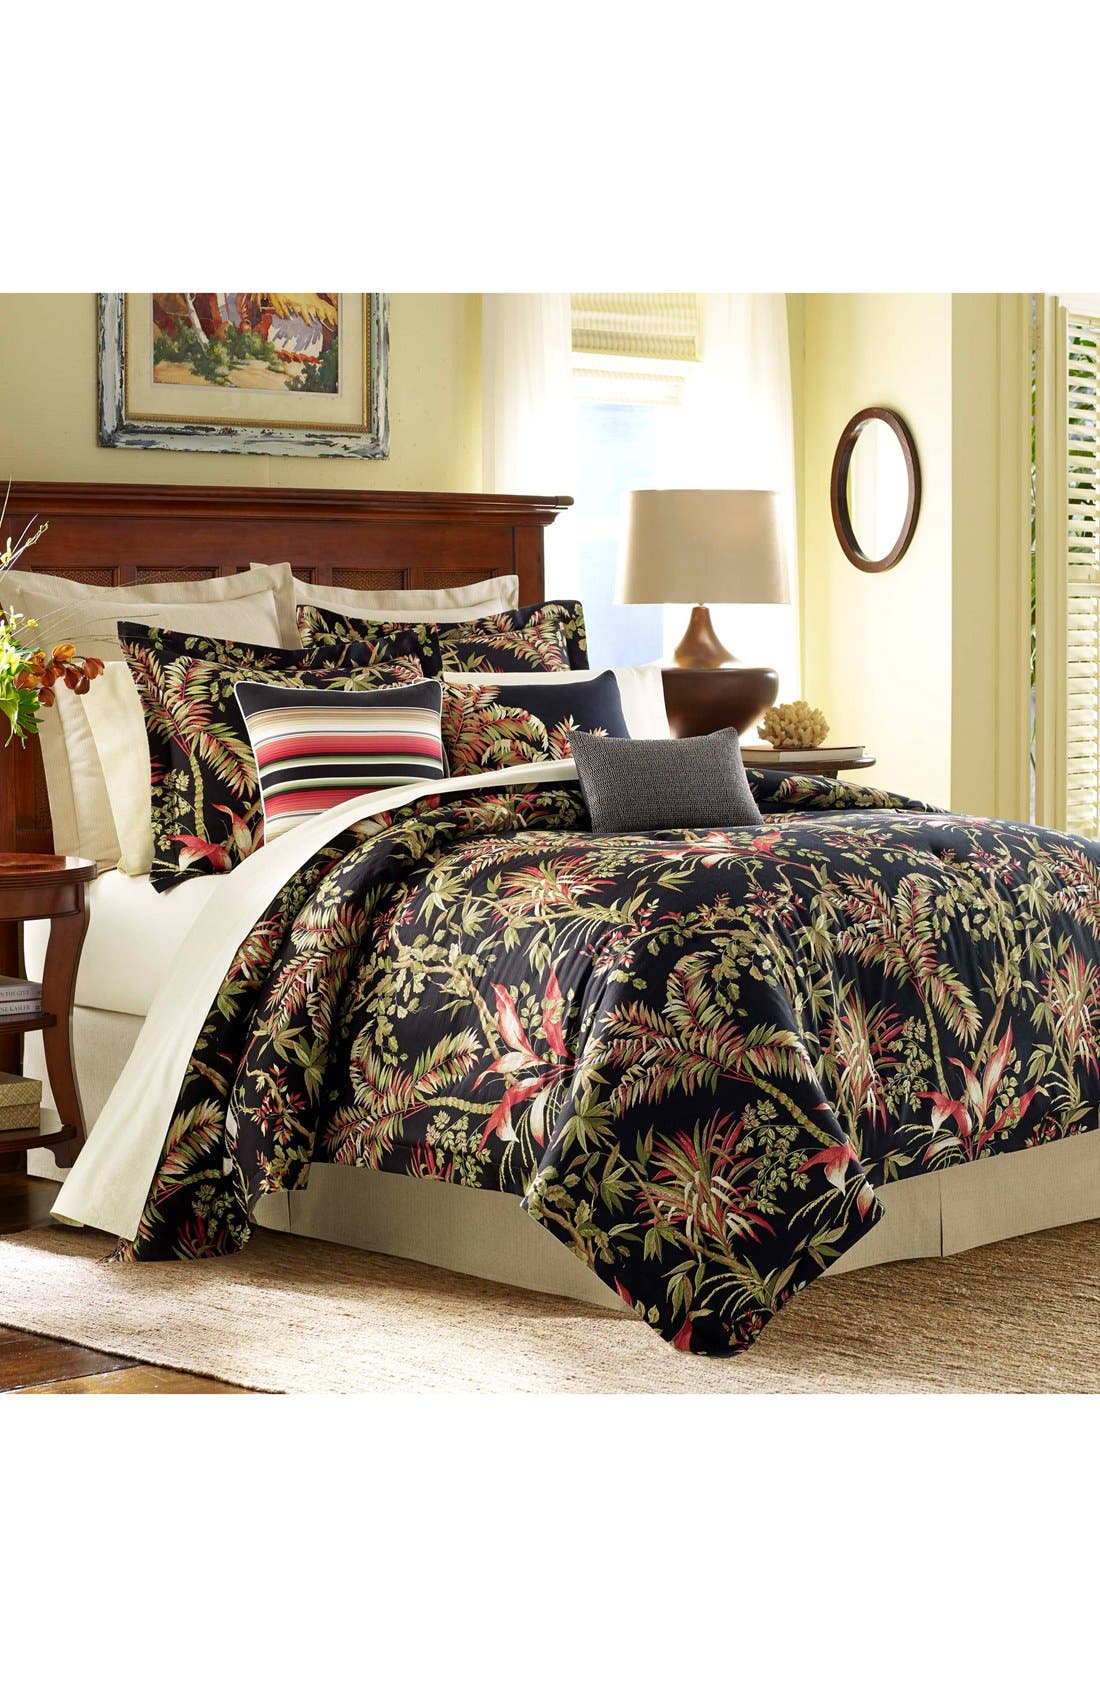 Main Image - Tommy Bahama Jungle Drive Comforter, Sham & Bed Skirt Set